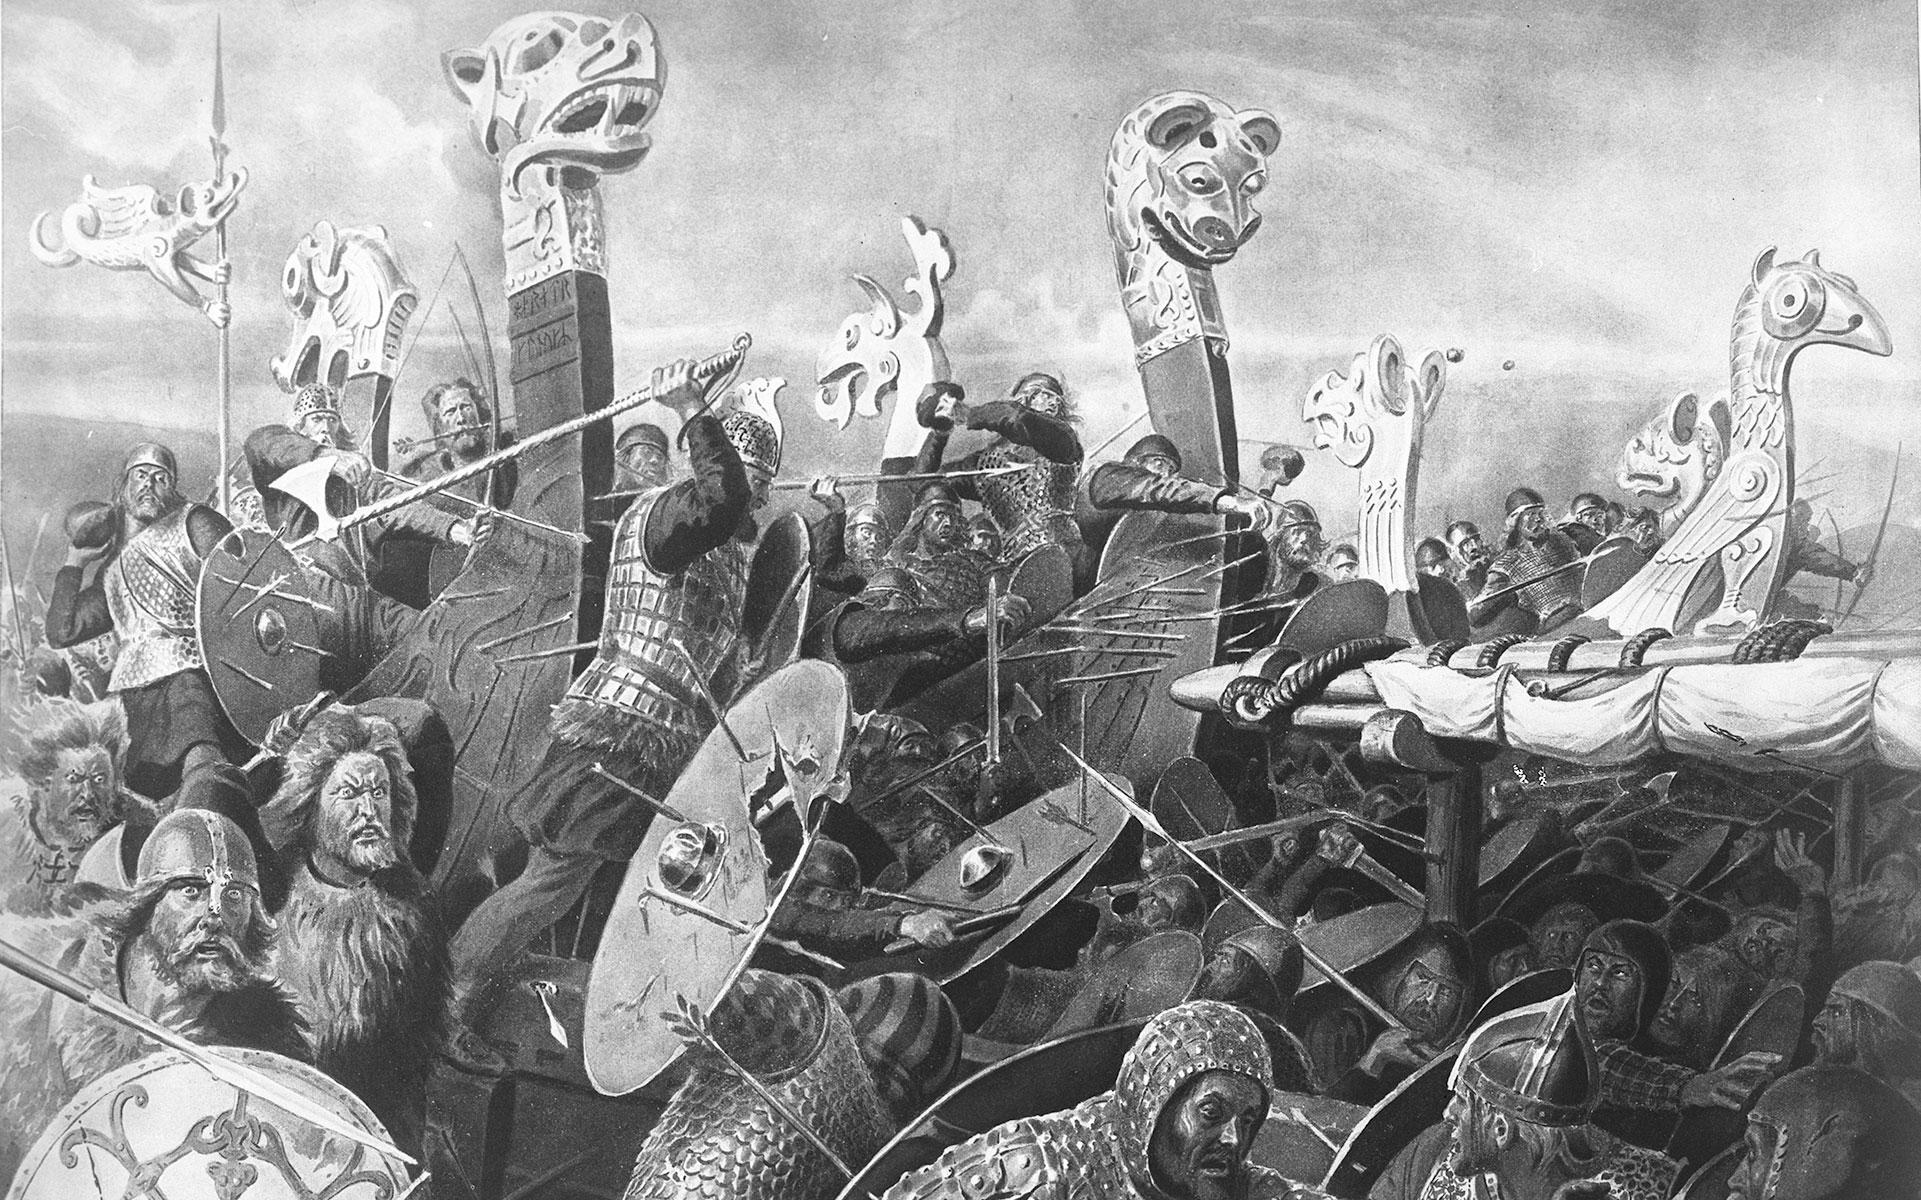 Utsnitt av Andreas Blochs bilde Slaget i Hafrsfjord